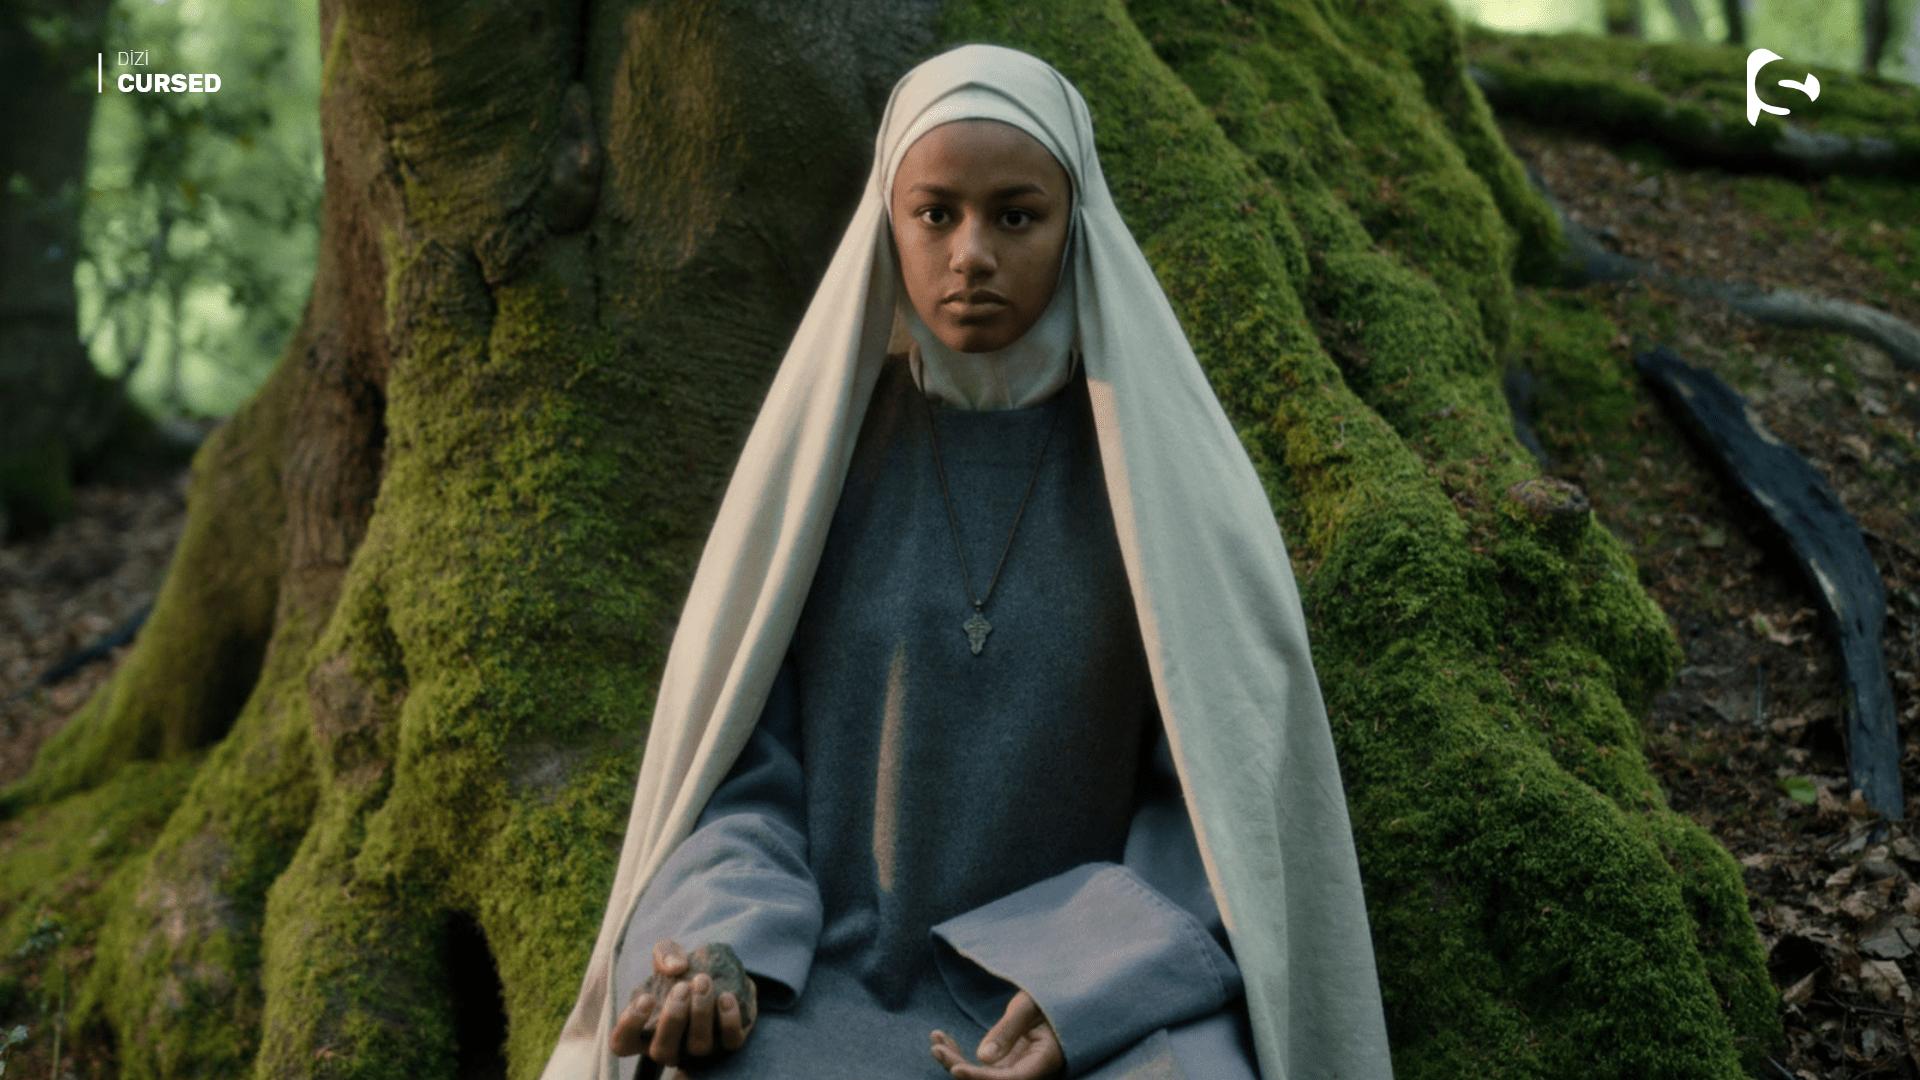 Sister Igraine - Shalom Brune-Franklin